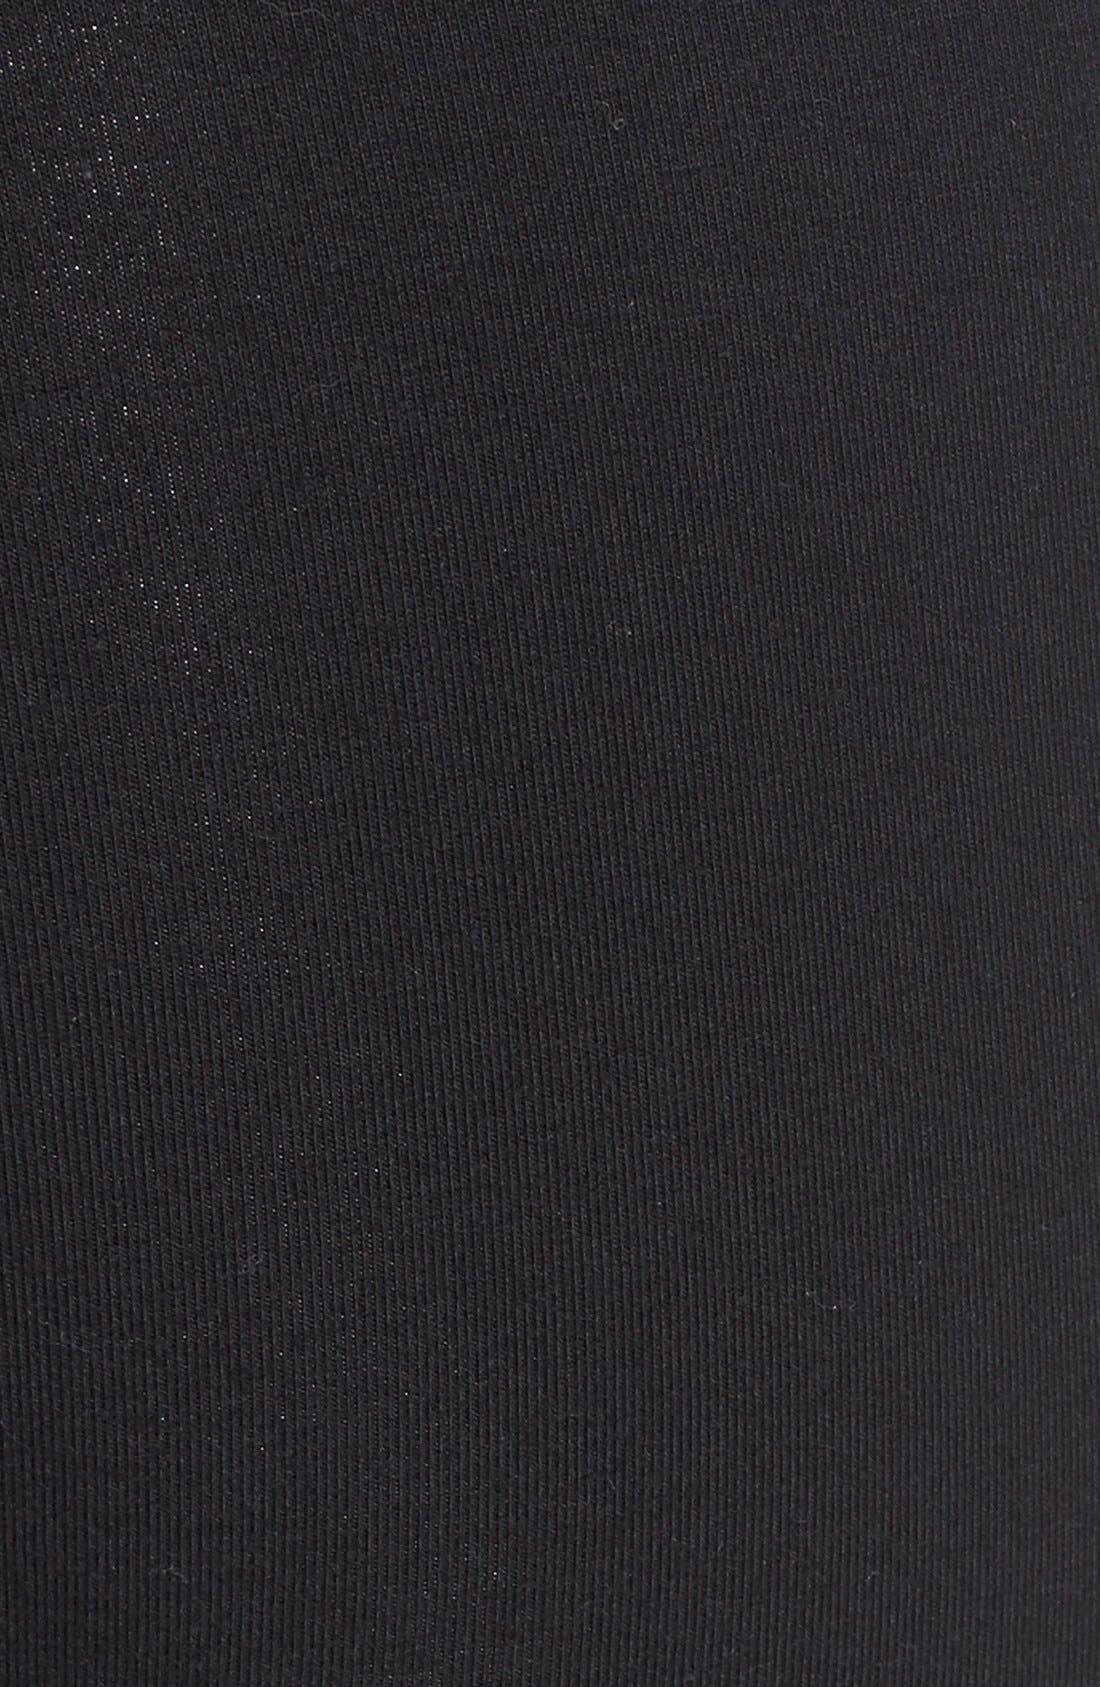 Control Top High Waist Leggings,                             Alternate thumbnail 5, color,                             Black